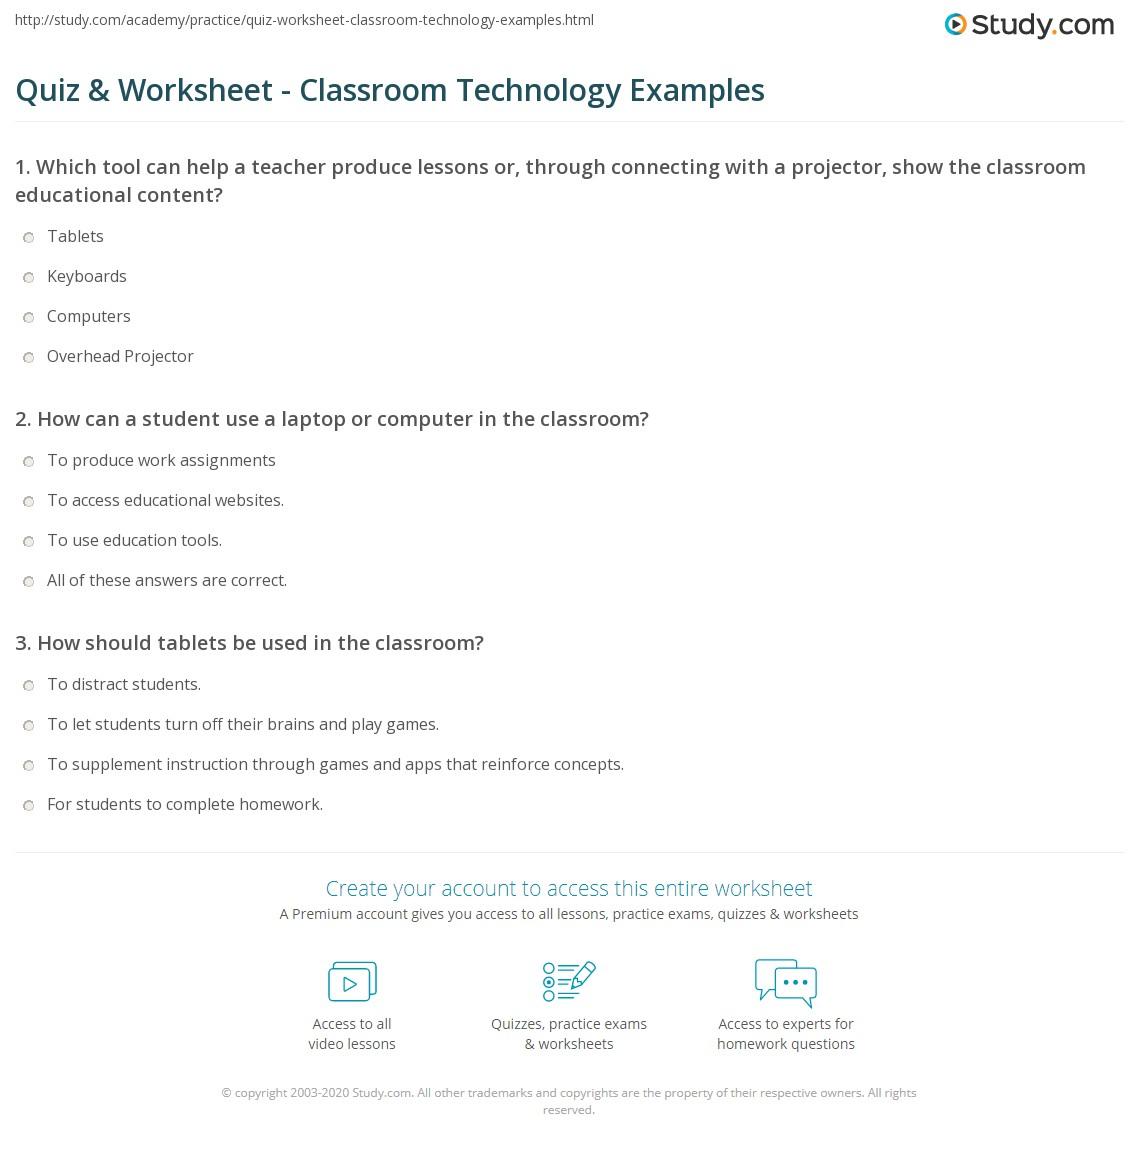 quiz worksheet classroom technology examples. Black Bedroom Furniture Sets. Home Design Ideas